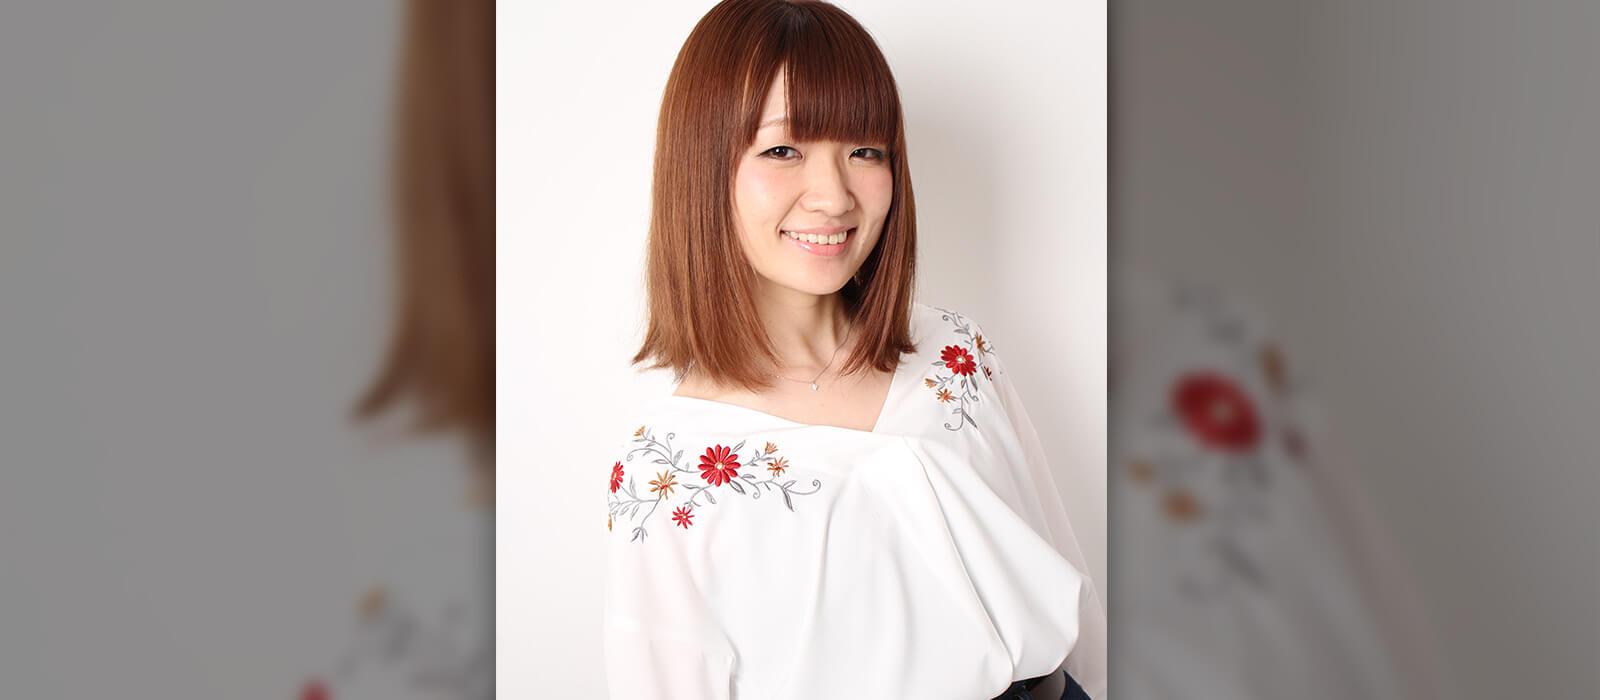 Entrevista com Atsumi Tanezaki, dubladora de Chise Hatori